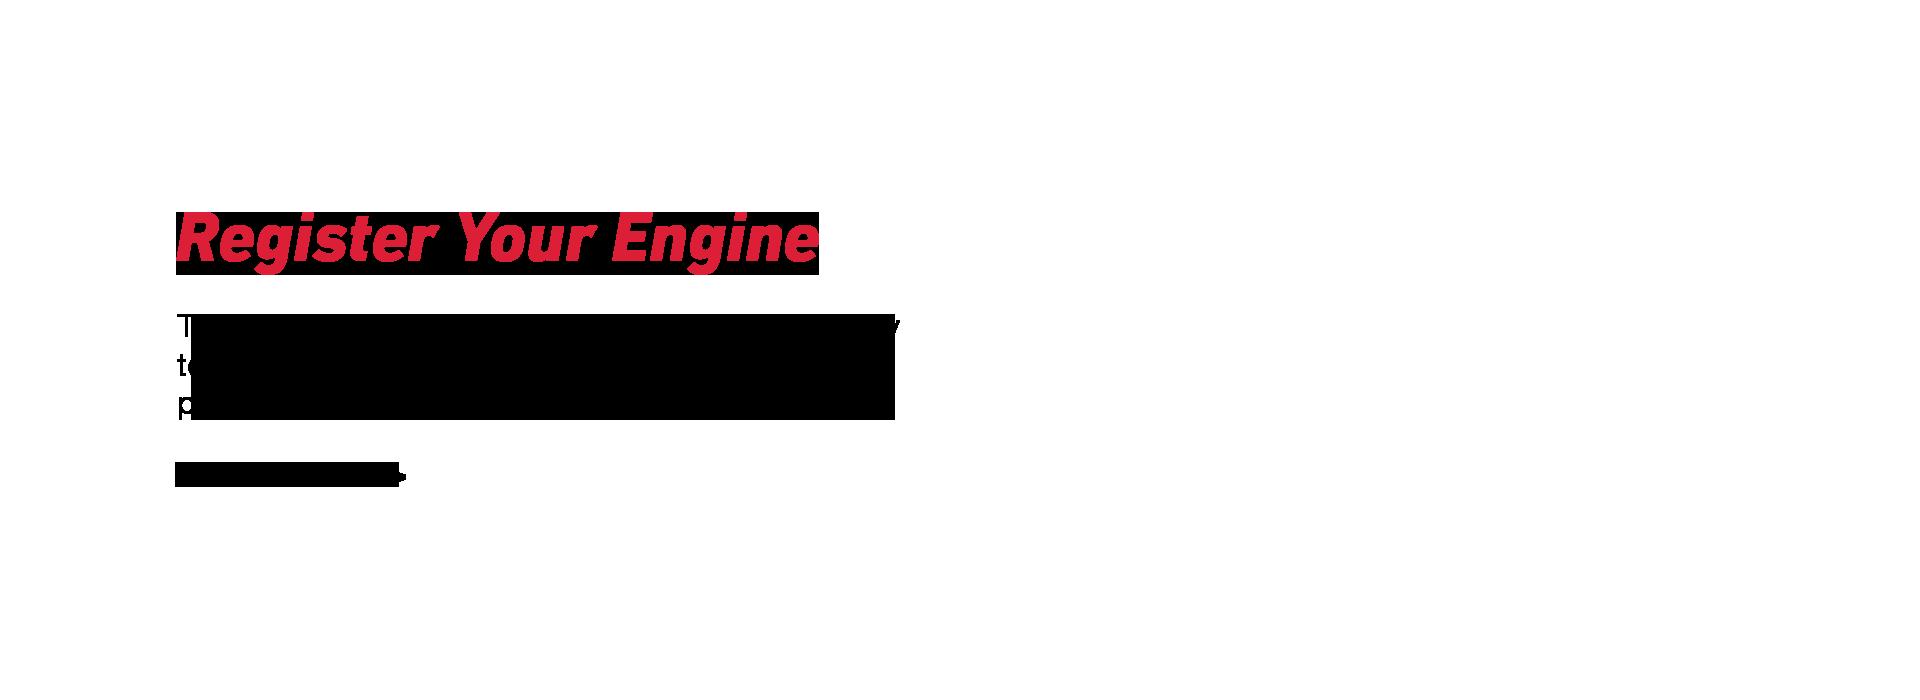 Register your engine